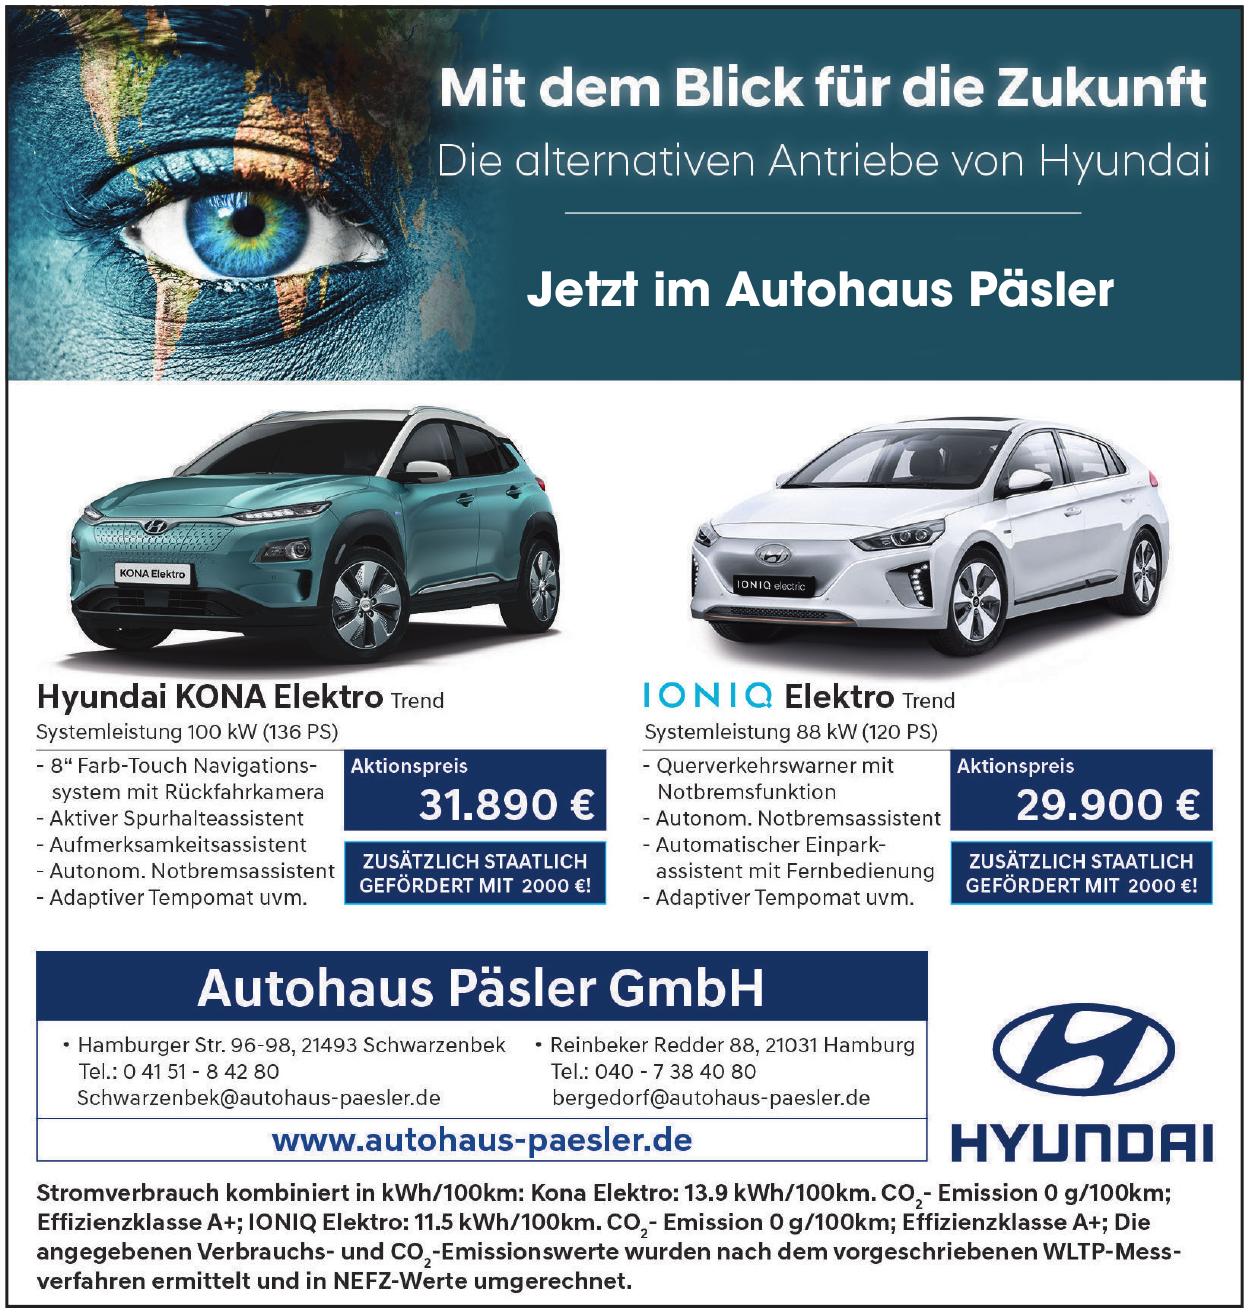 Autohaus Päsler GmbH